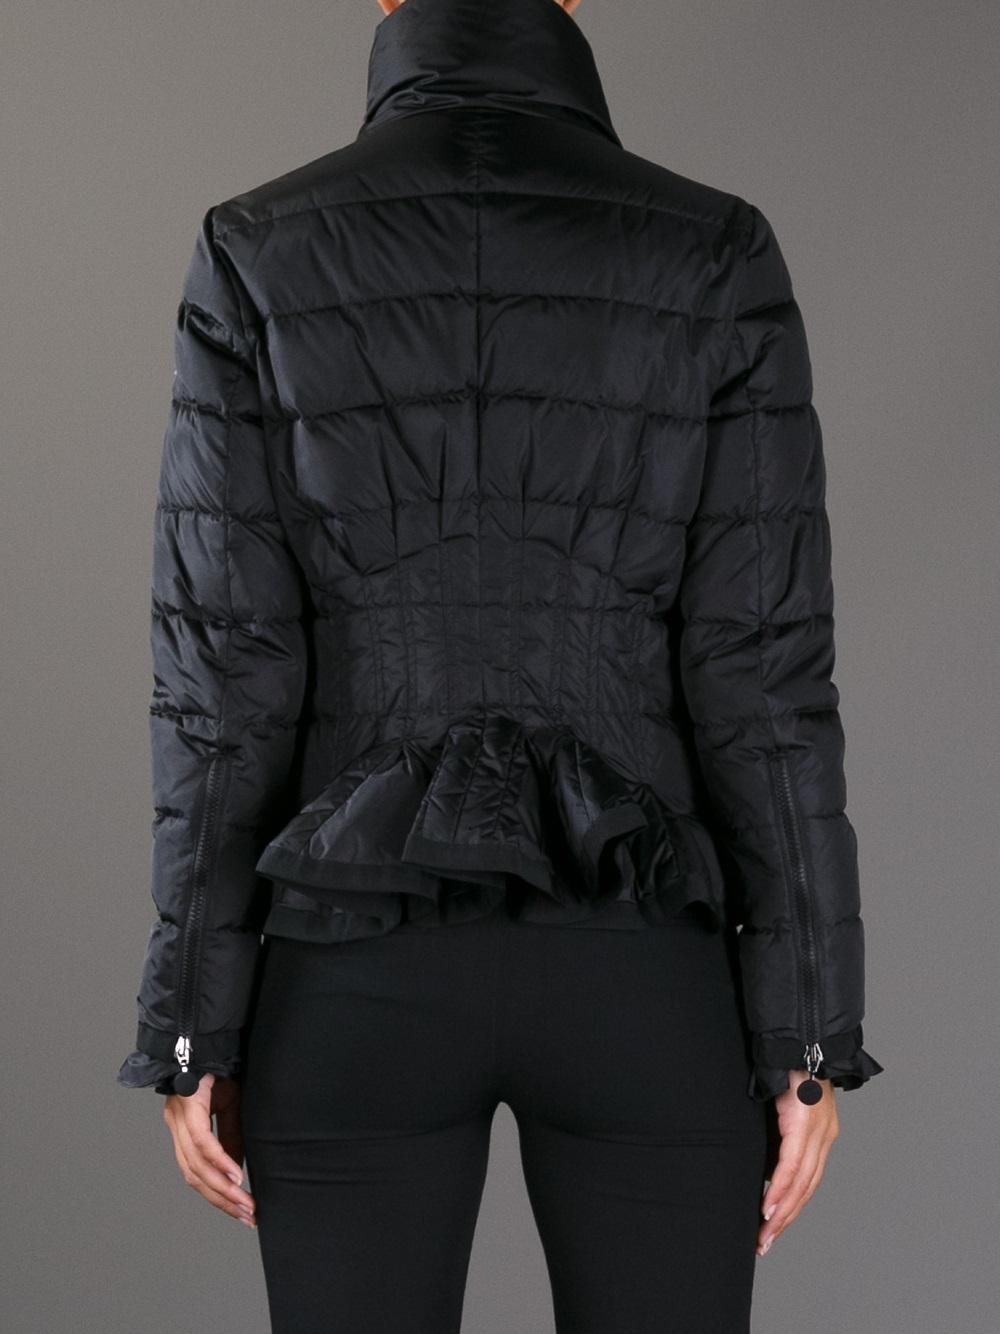 new nwt black moncler women lans lightweight padded puffer jacket size 00 xxs tvardp 1143 28. Black Bedroom Furniture Sets. Home Design Ideas